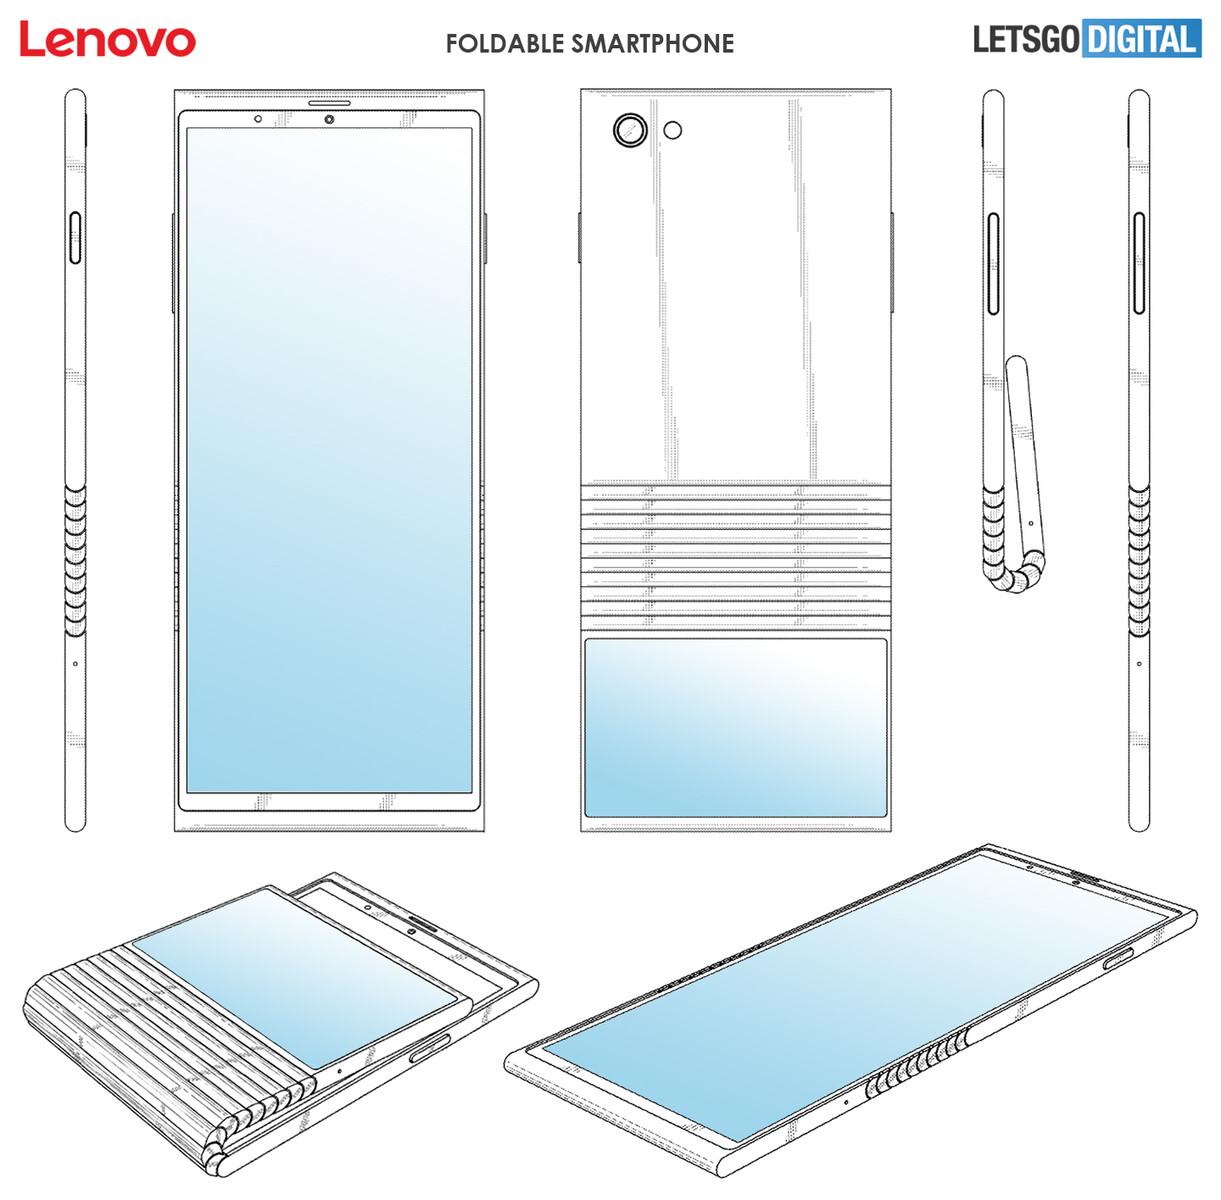 csm Lenovo2 d010e74f73